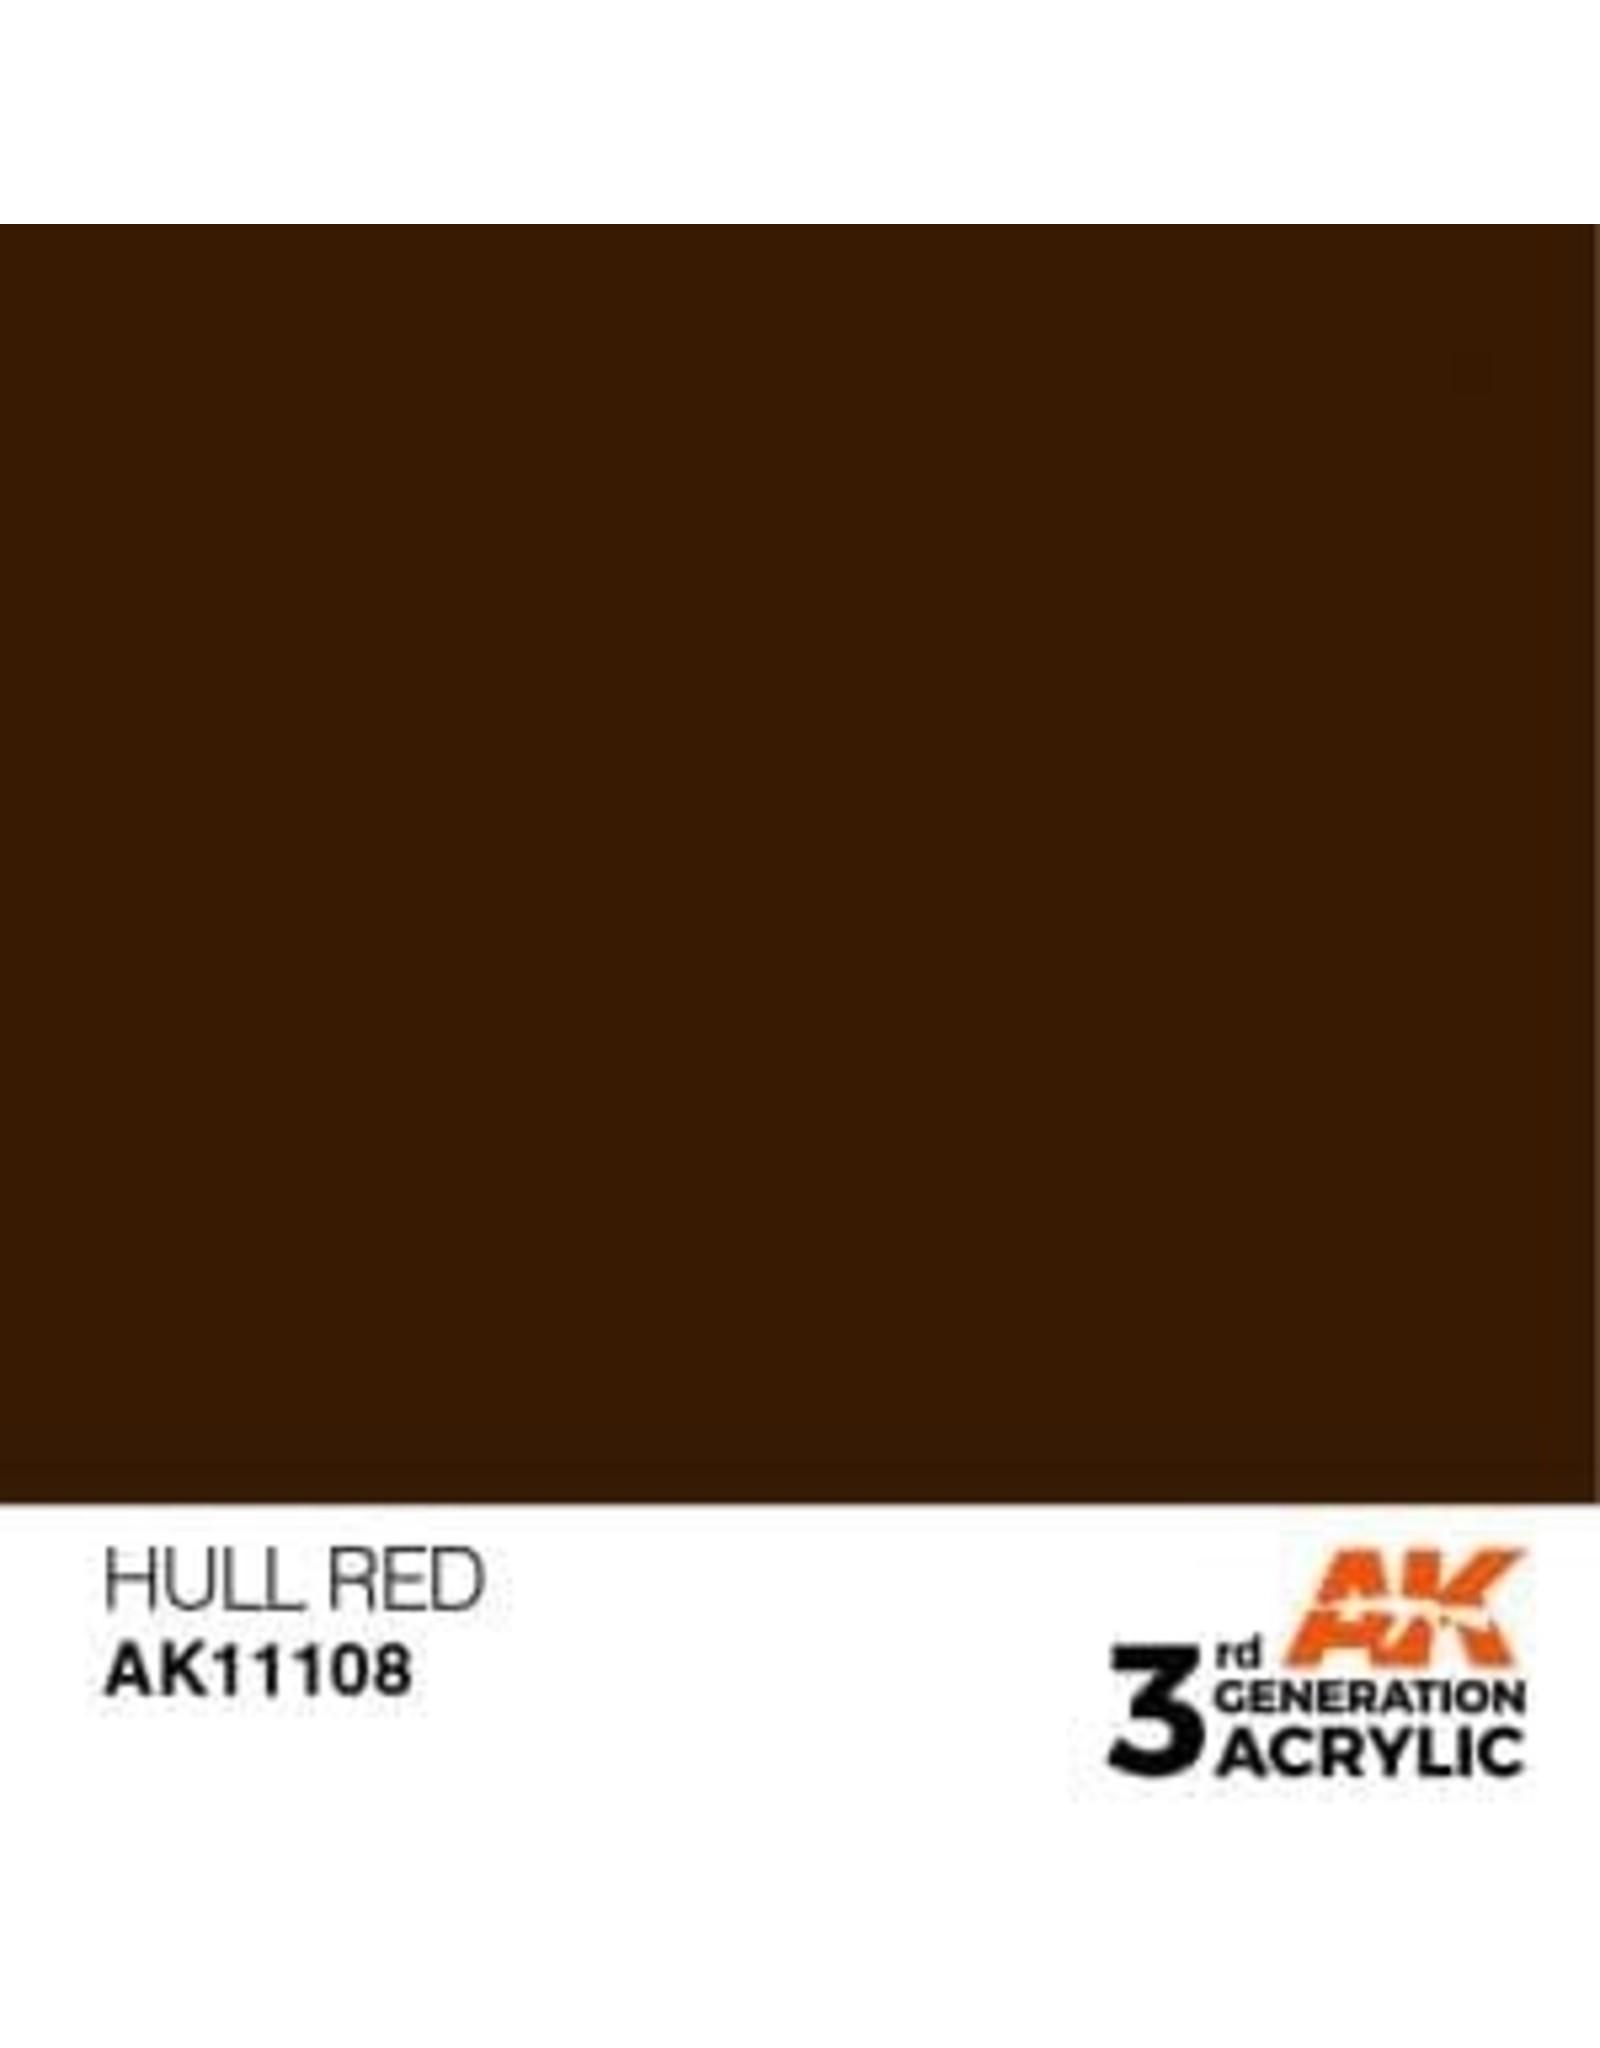 AK Interactive 3RD GEN ACRYLIC HULL RED 17ML